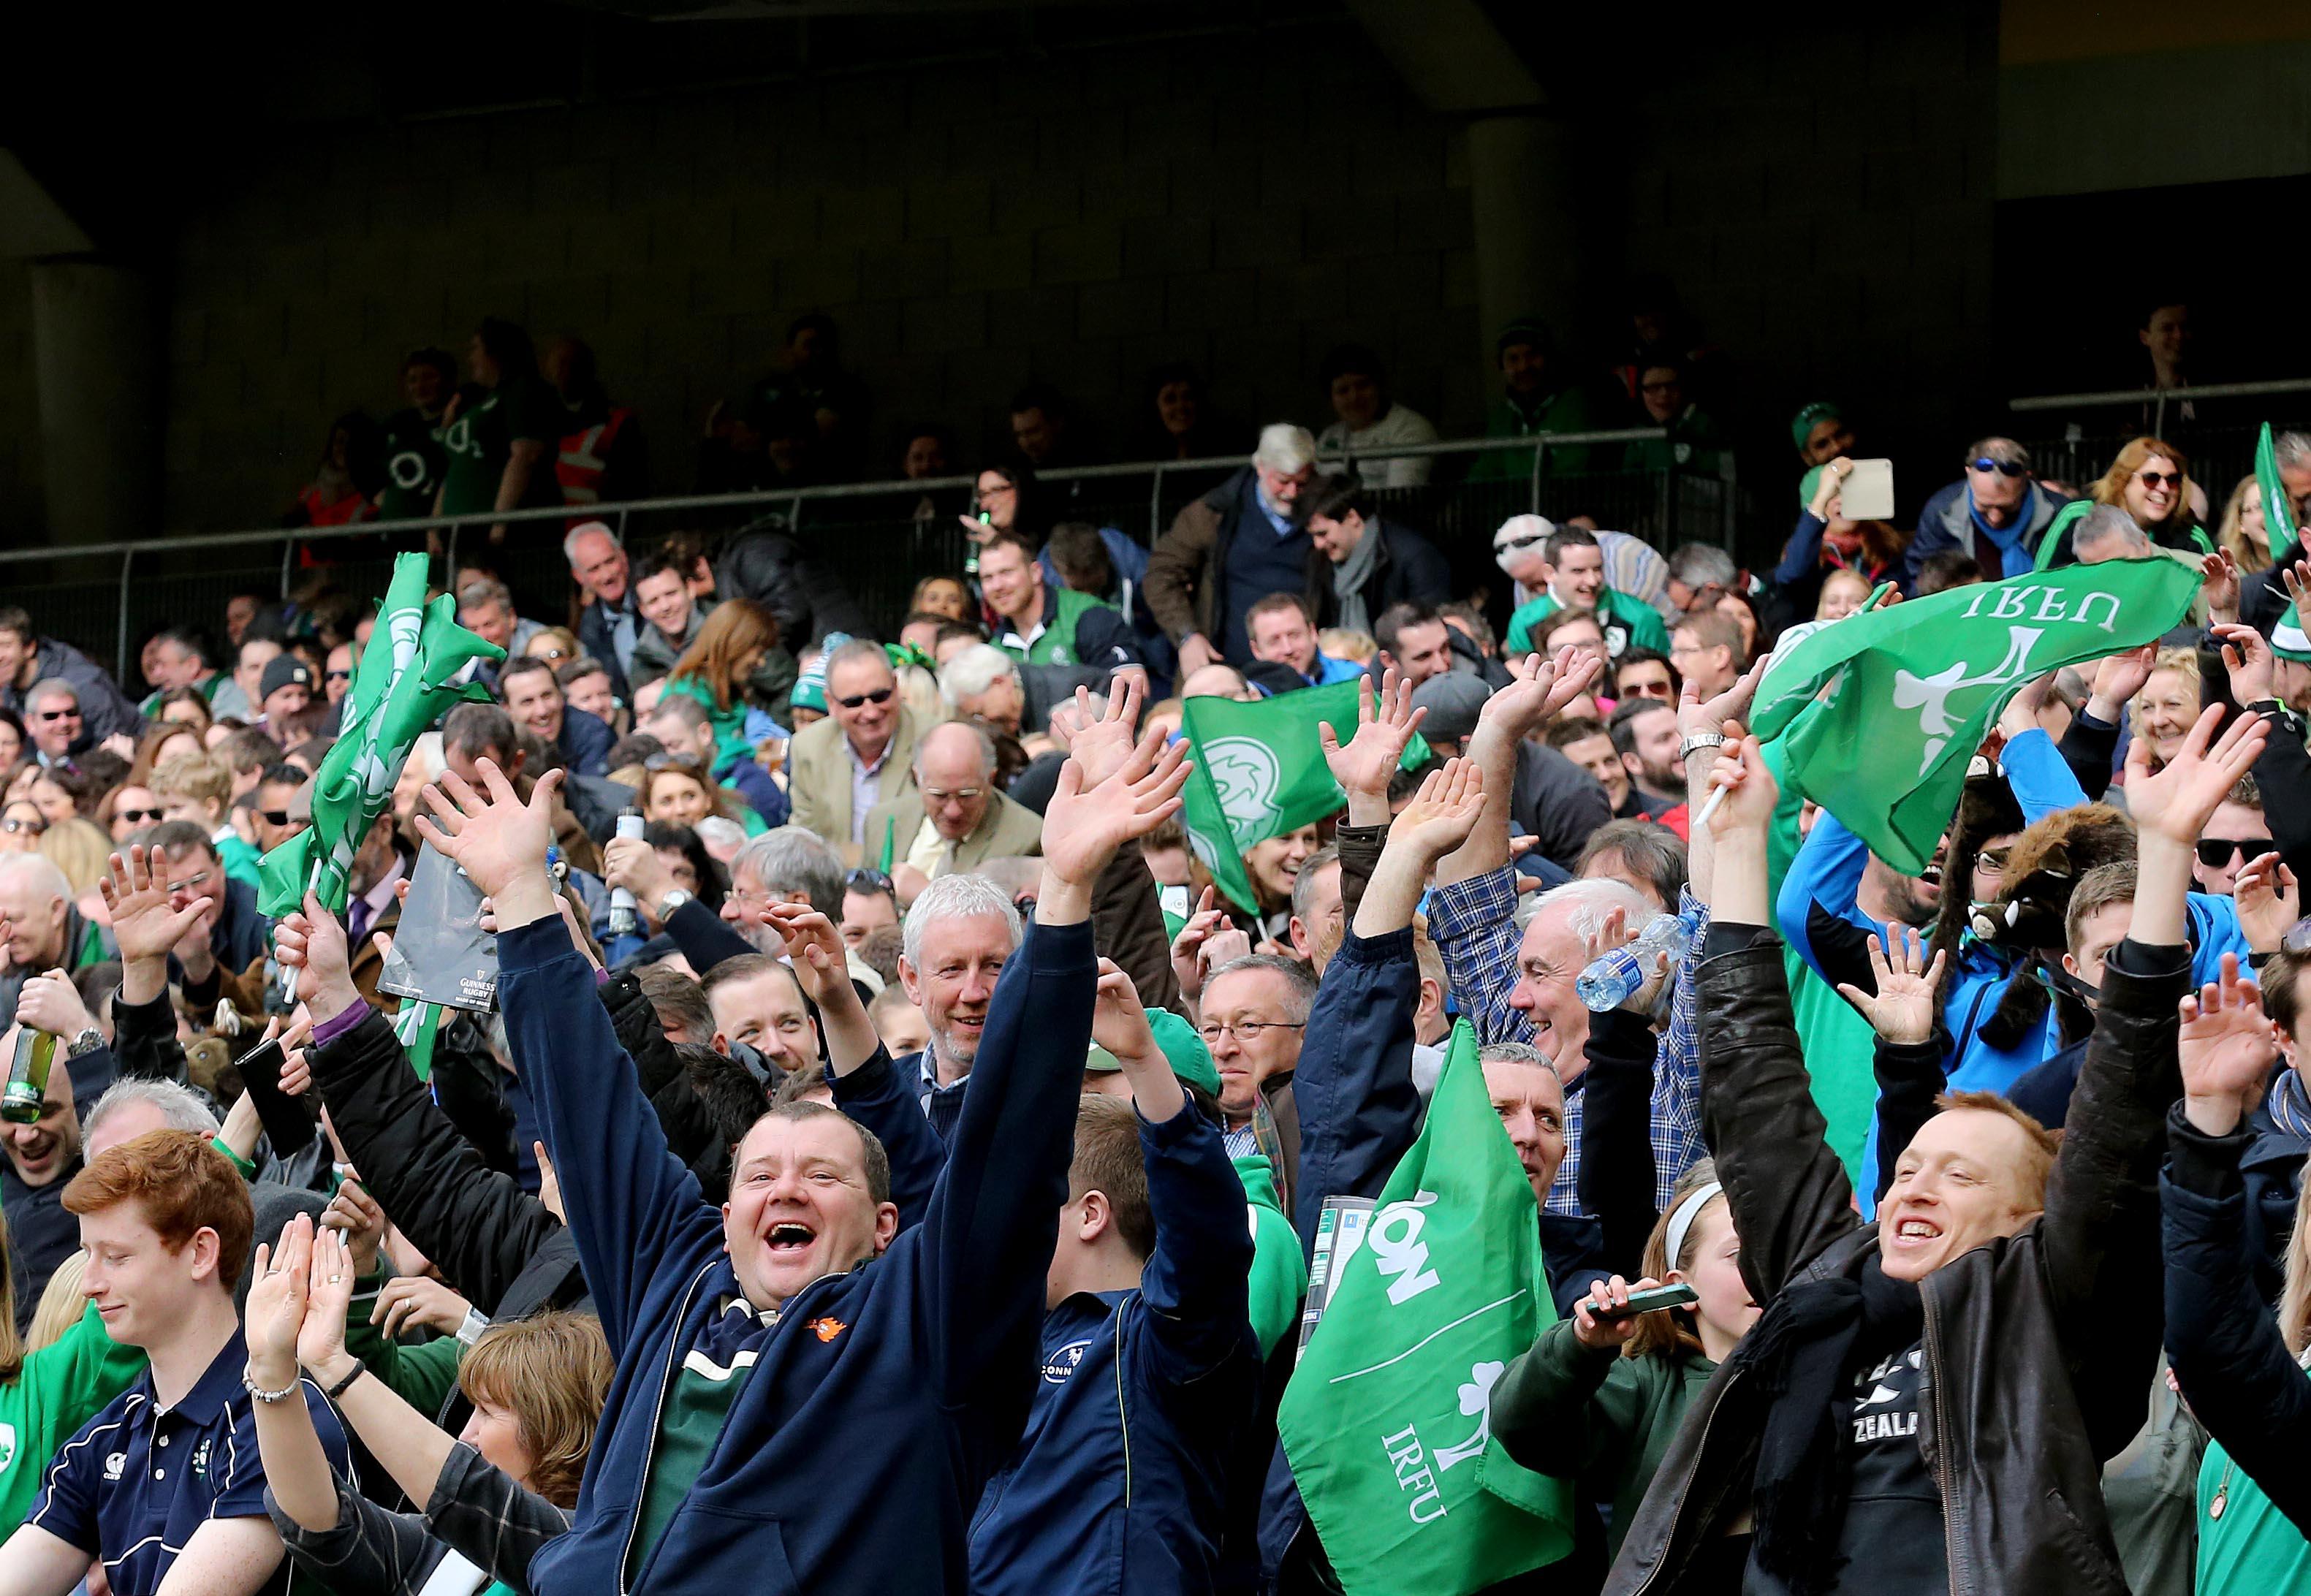 RBS 6 Nations Championship Round 4, Aviva Stadium, Dublin 12/3/2016 Ireland vs Italy Ireland fans do a mexican wave  Mandatory Credit ©INPHO/Ryan Byrne